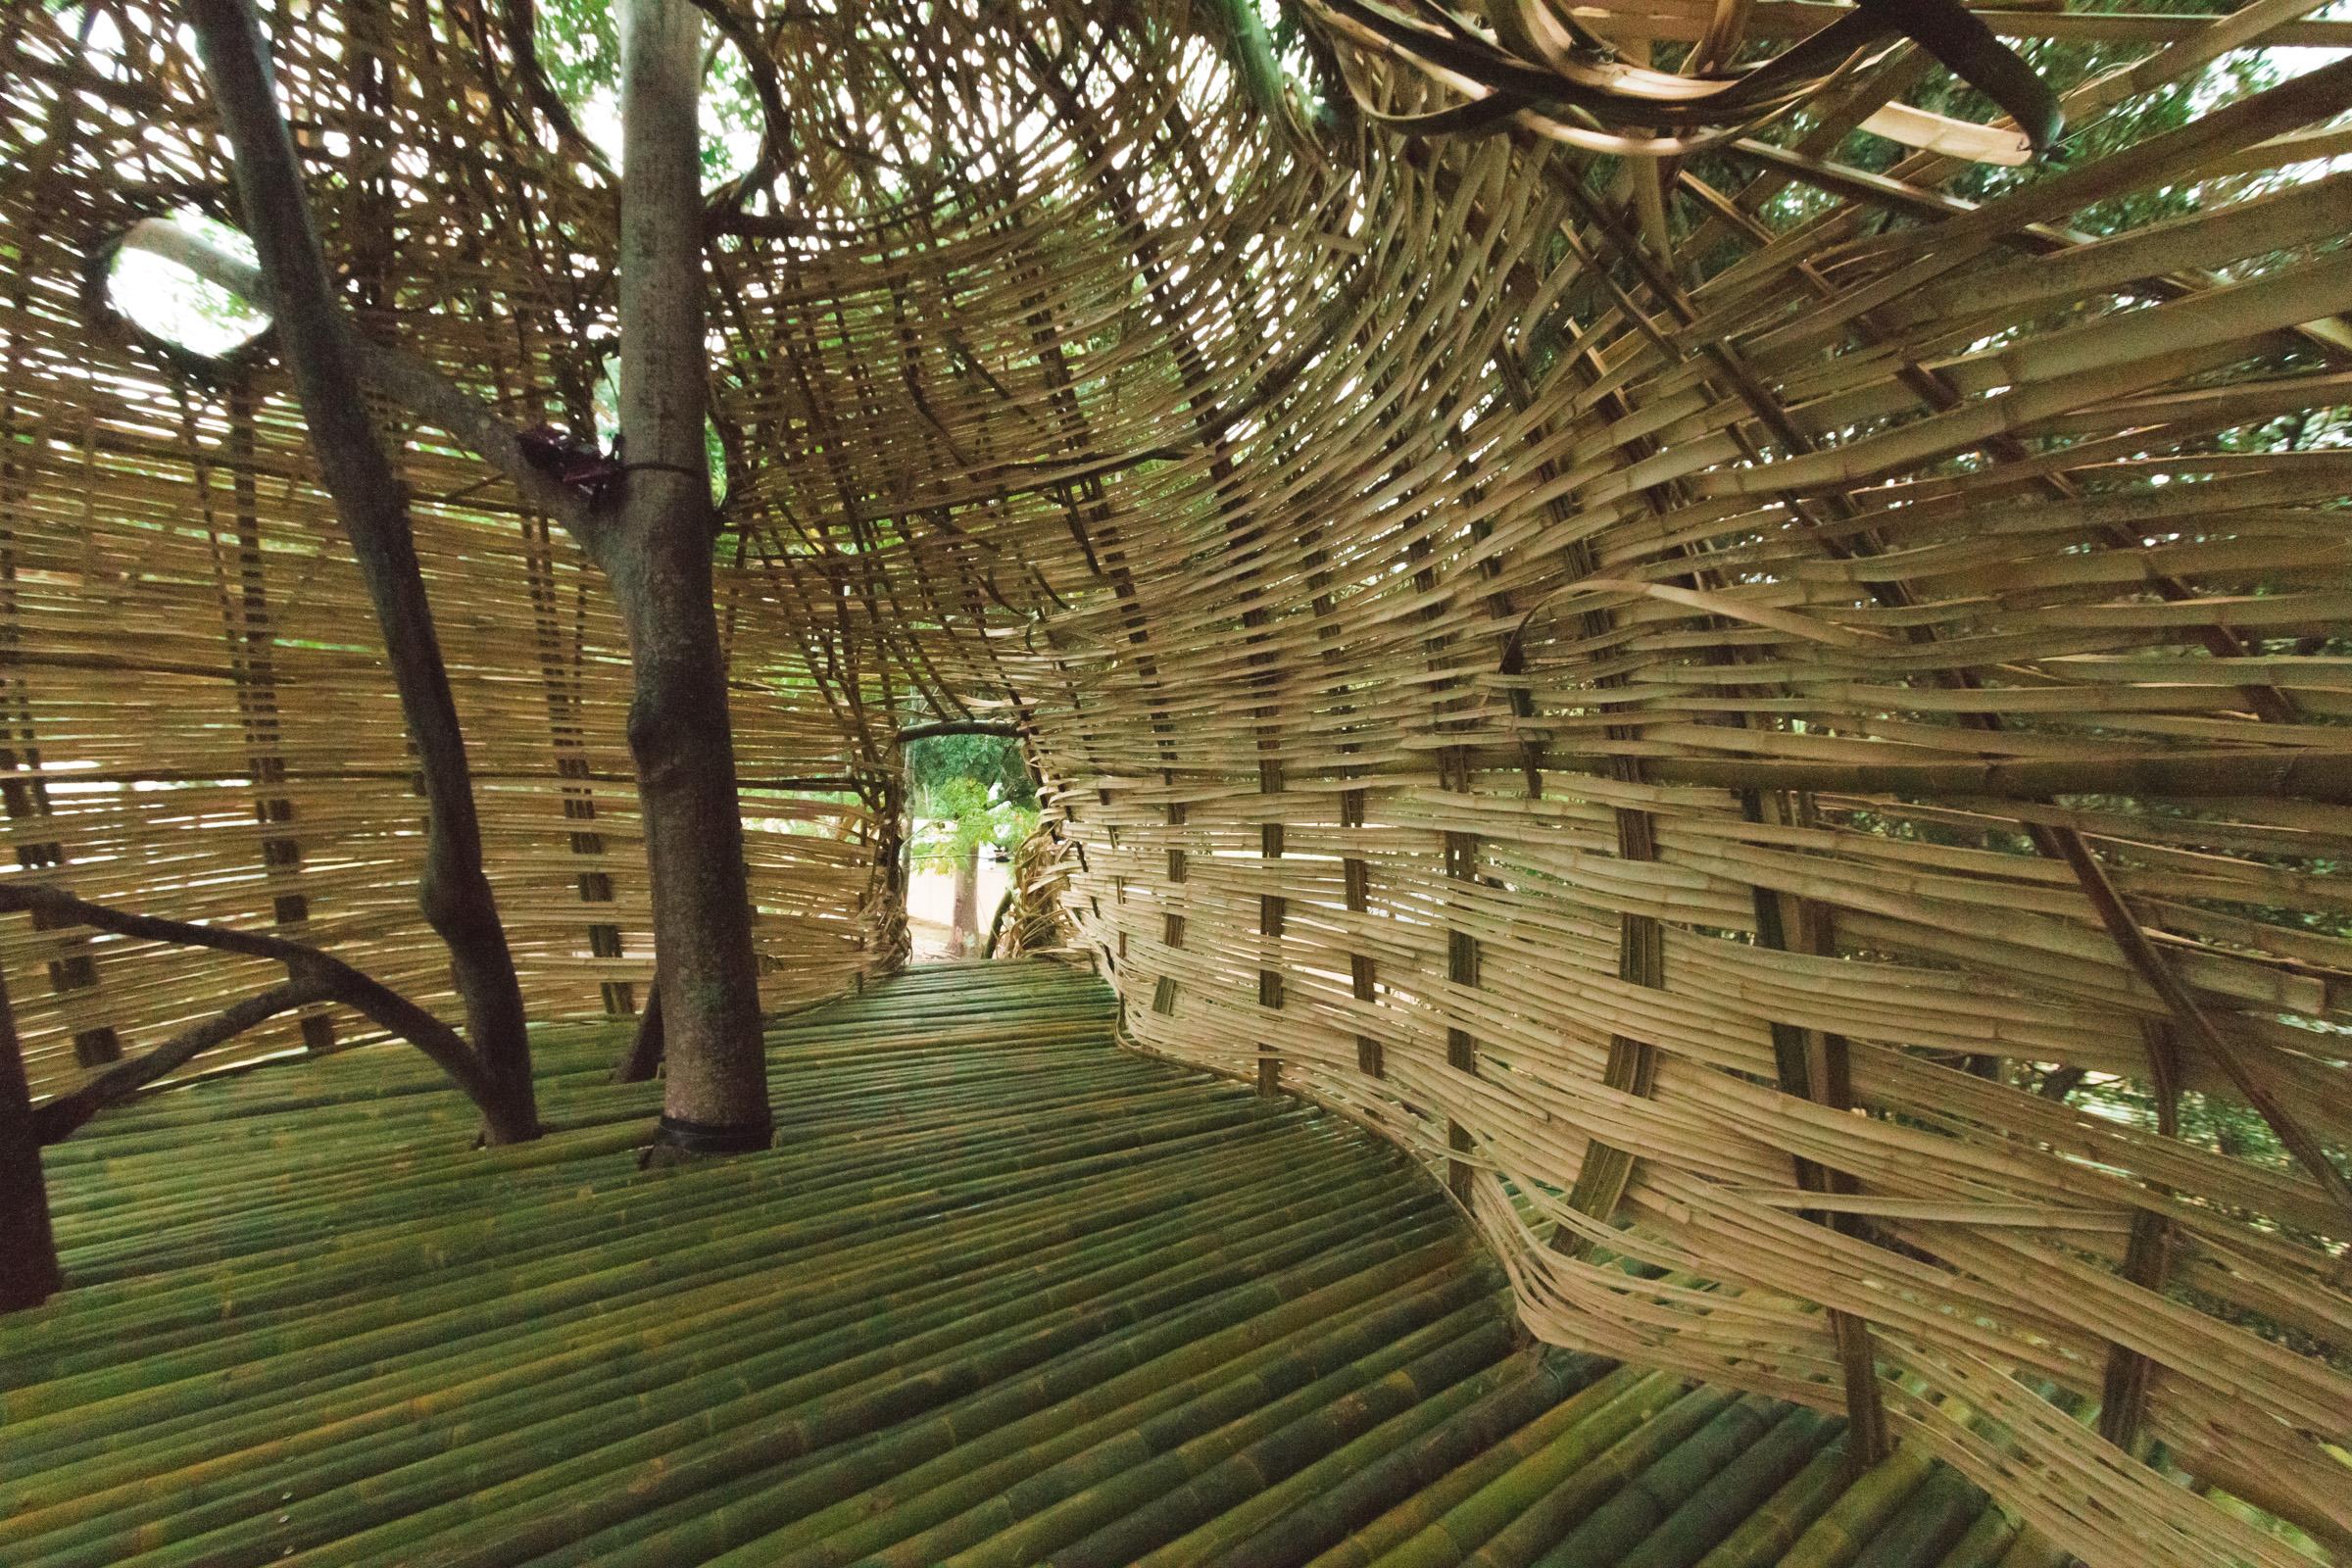 Tree house photography by Mercurio Alvarado  (19 of 132).jpg